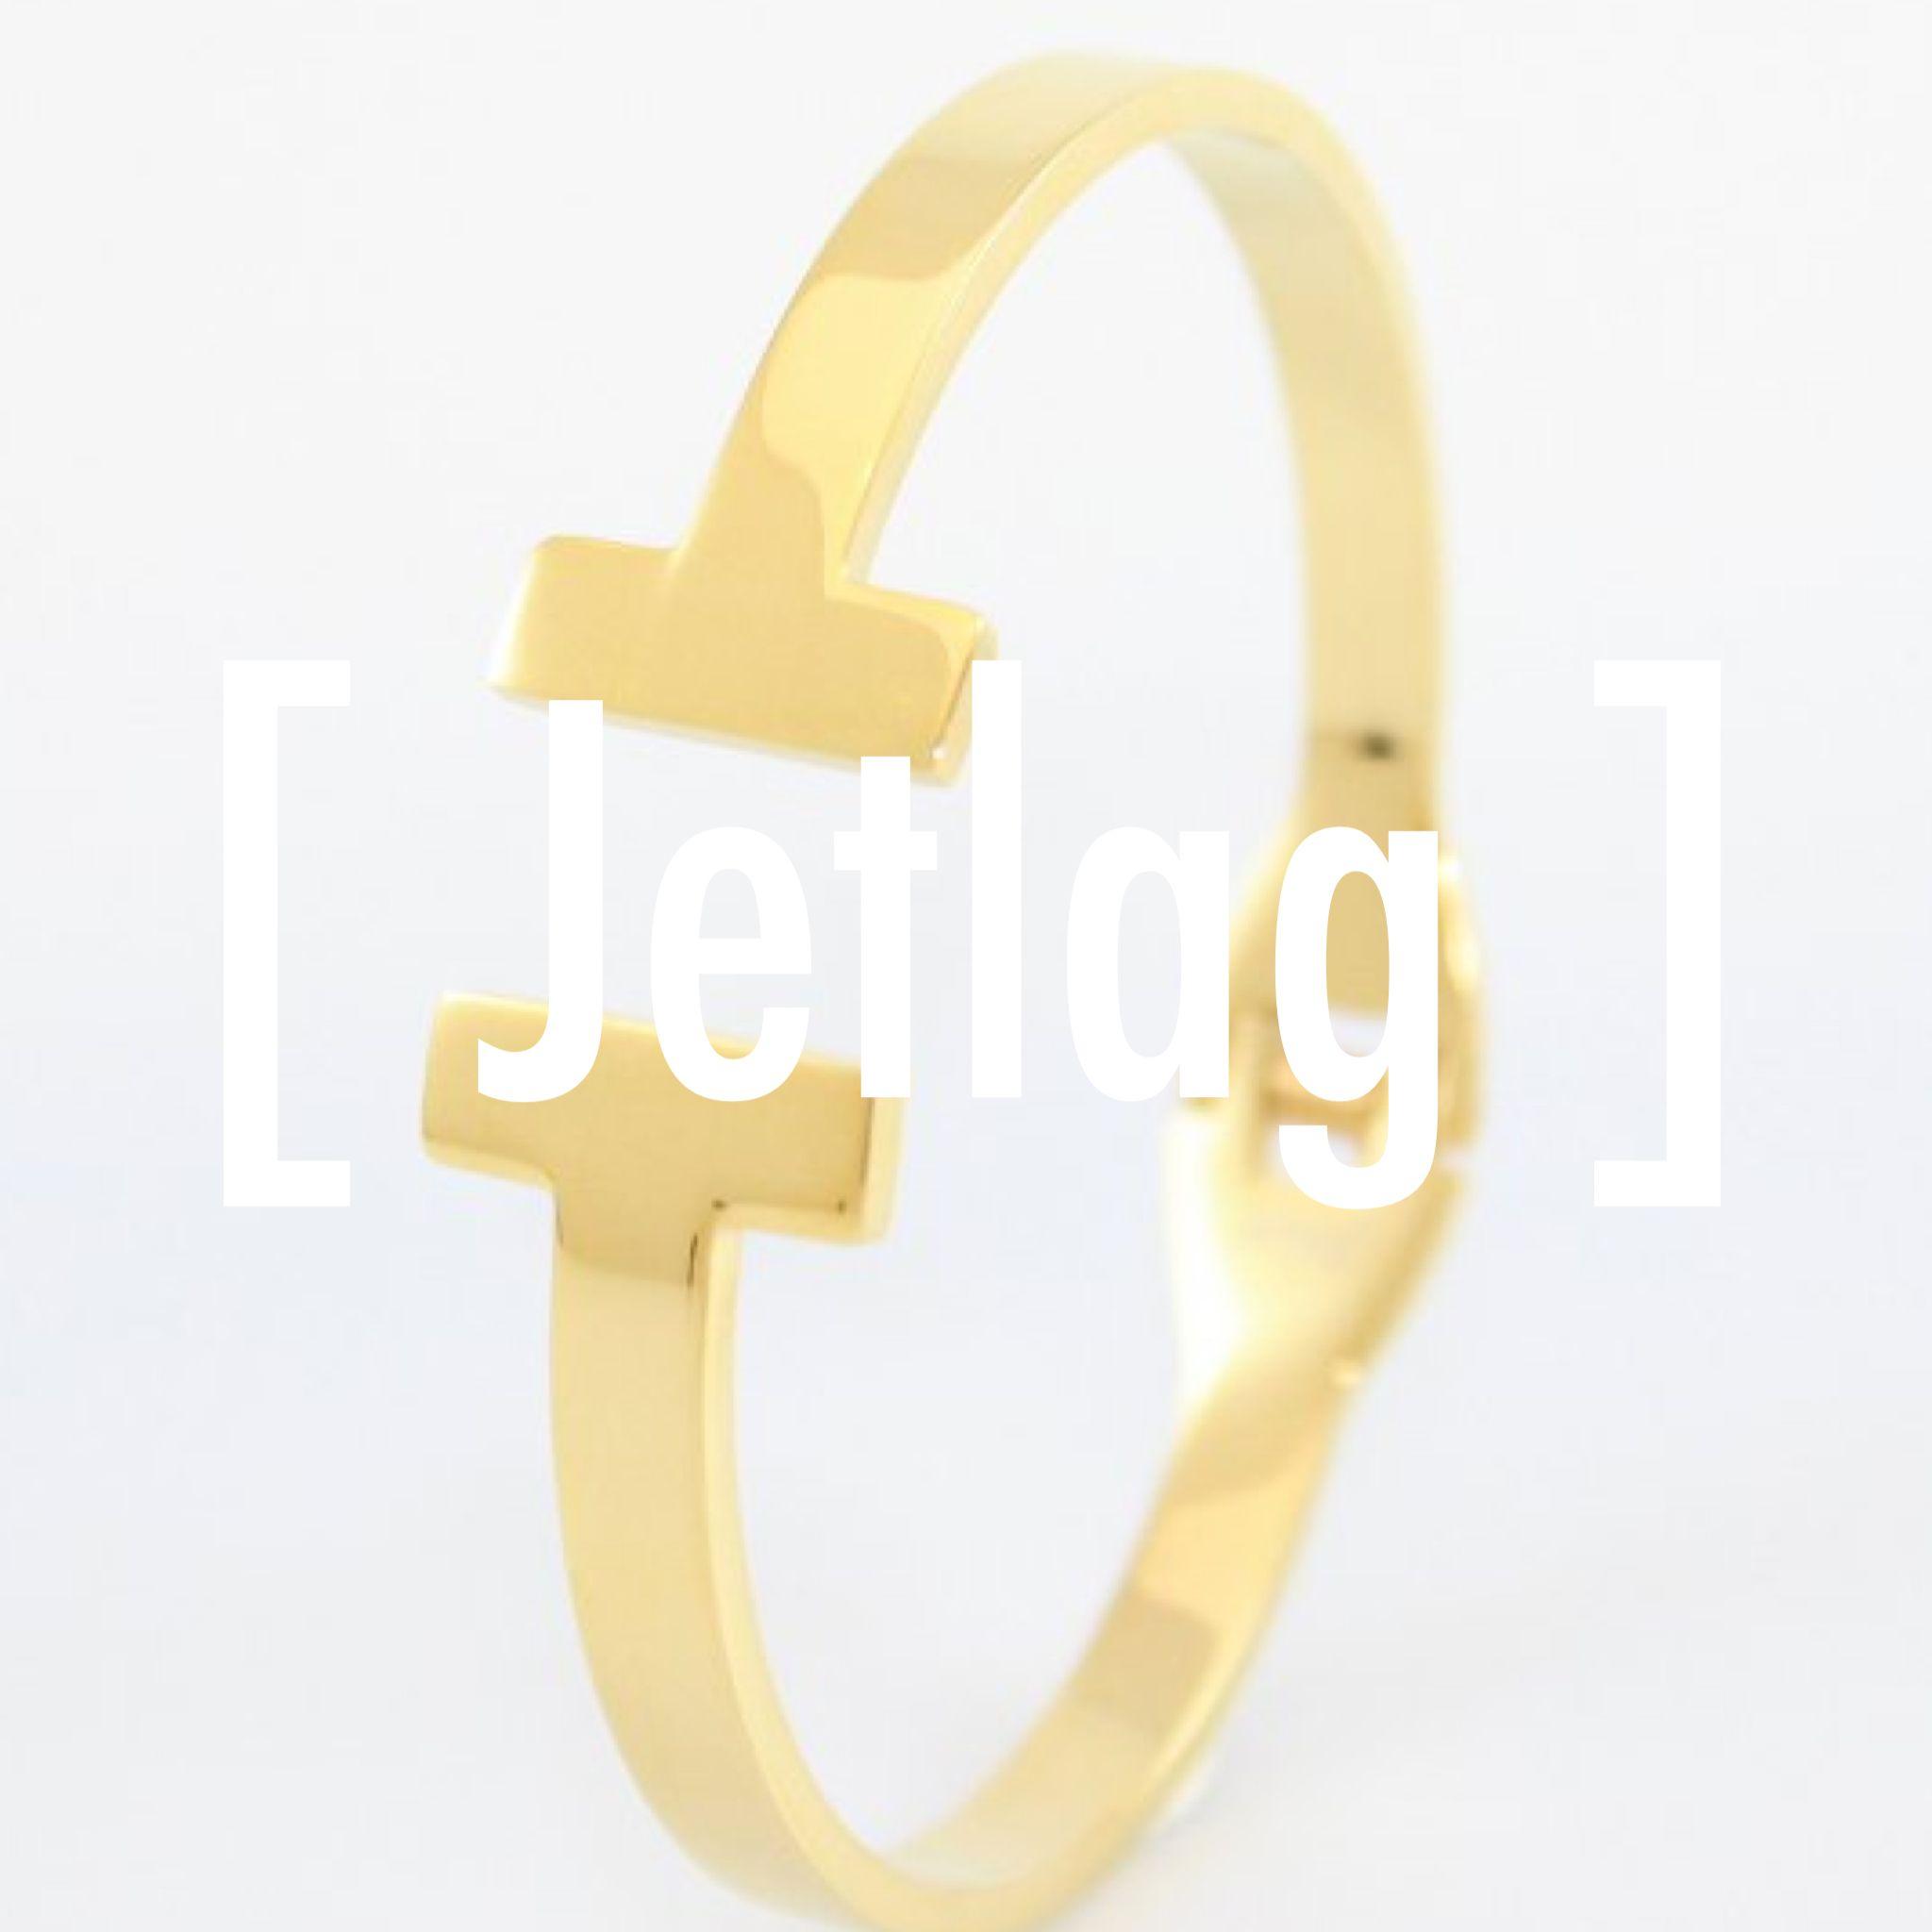 1d90d9b8ae Pin do(a) Jetlag em Jetlag Collection